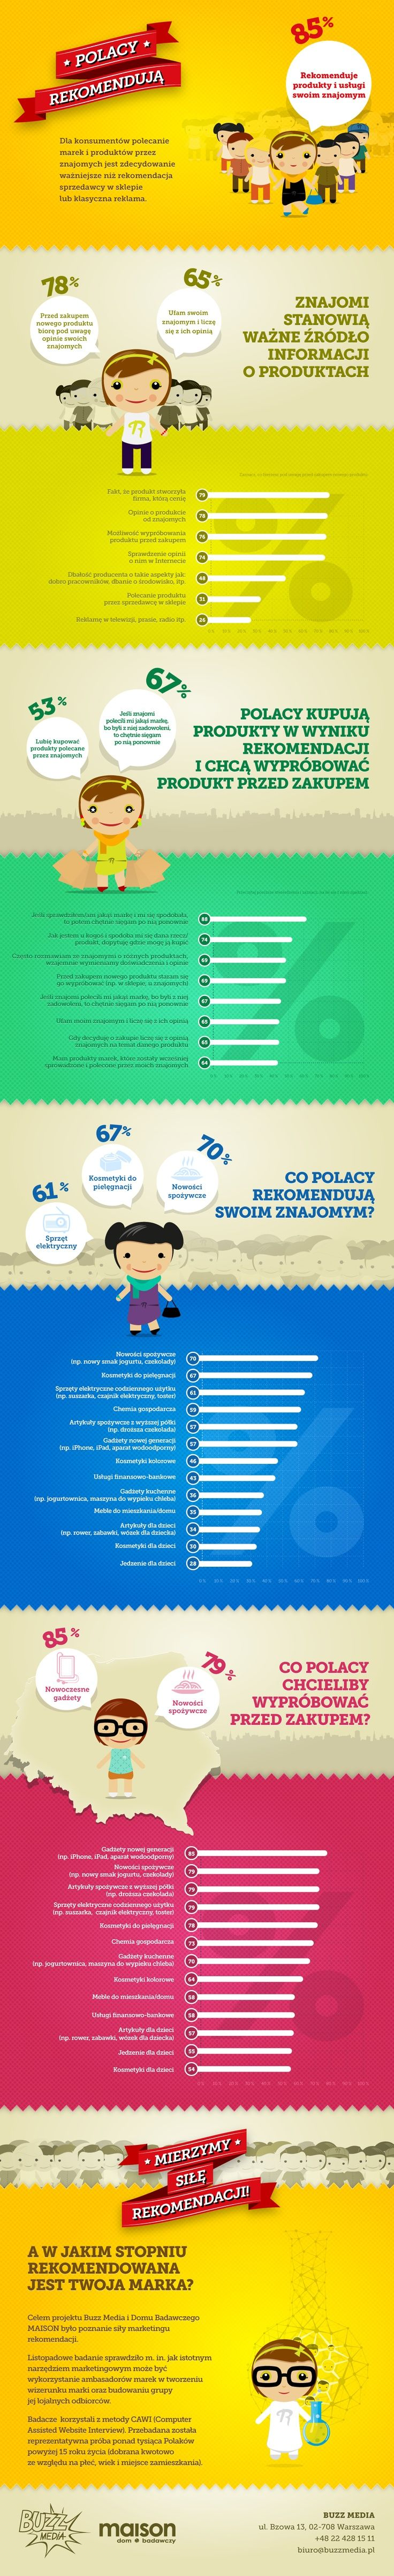 Polacy rekomendują! #marketingrekomendacji #rekomendujto #badania #infografika #infographic